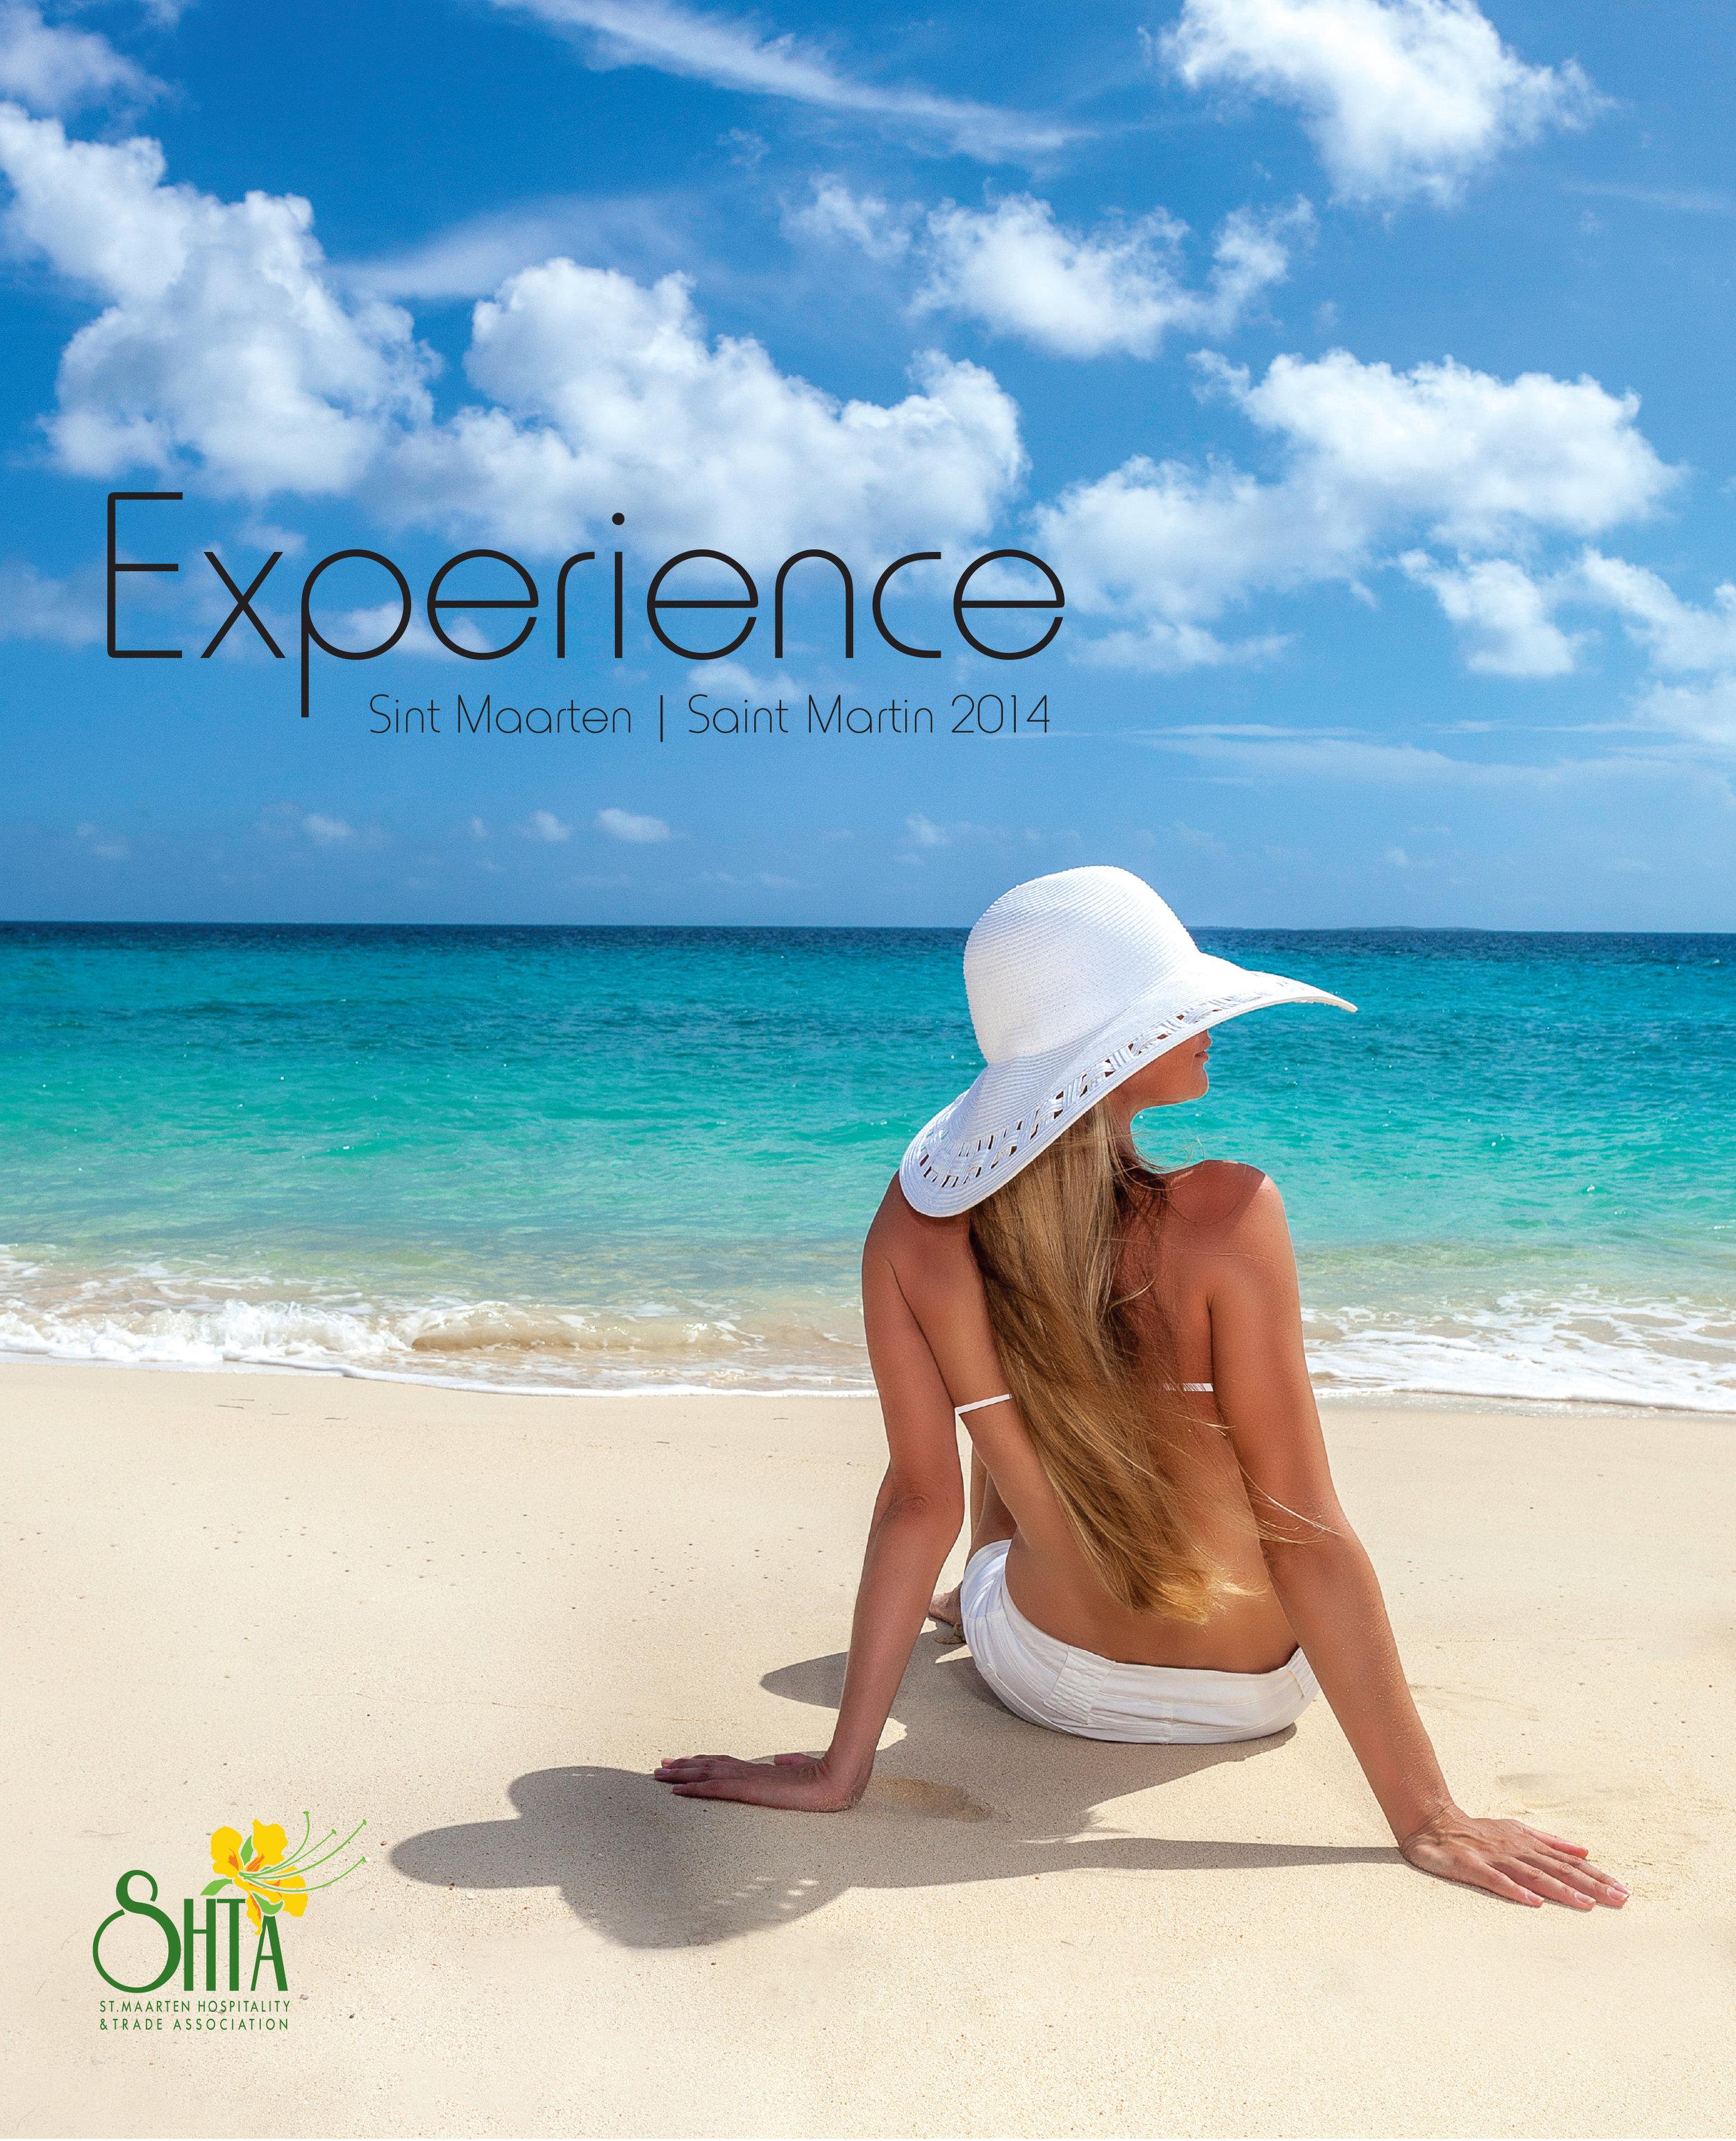 Experience St. Maarten\St. Martin